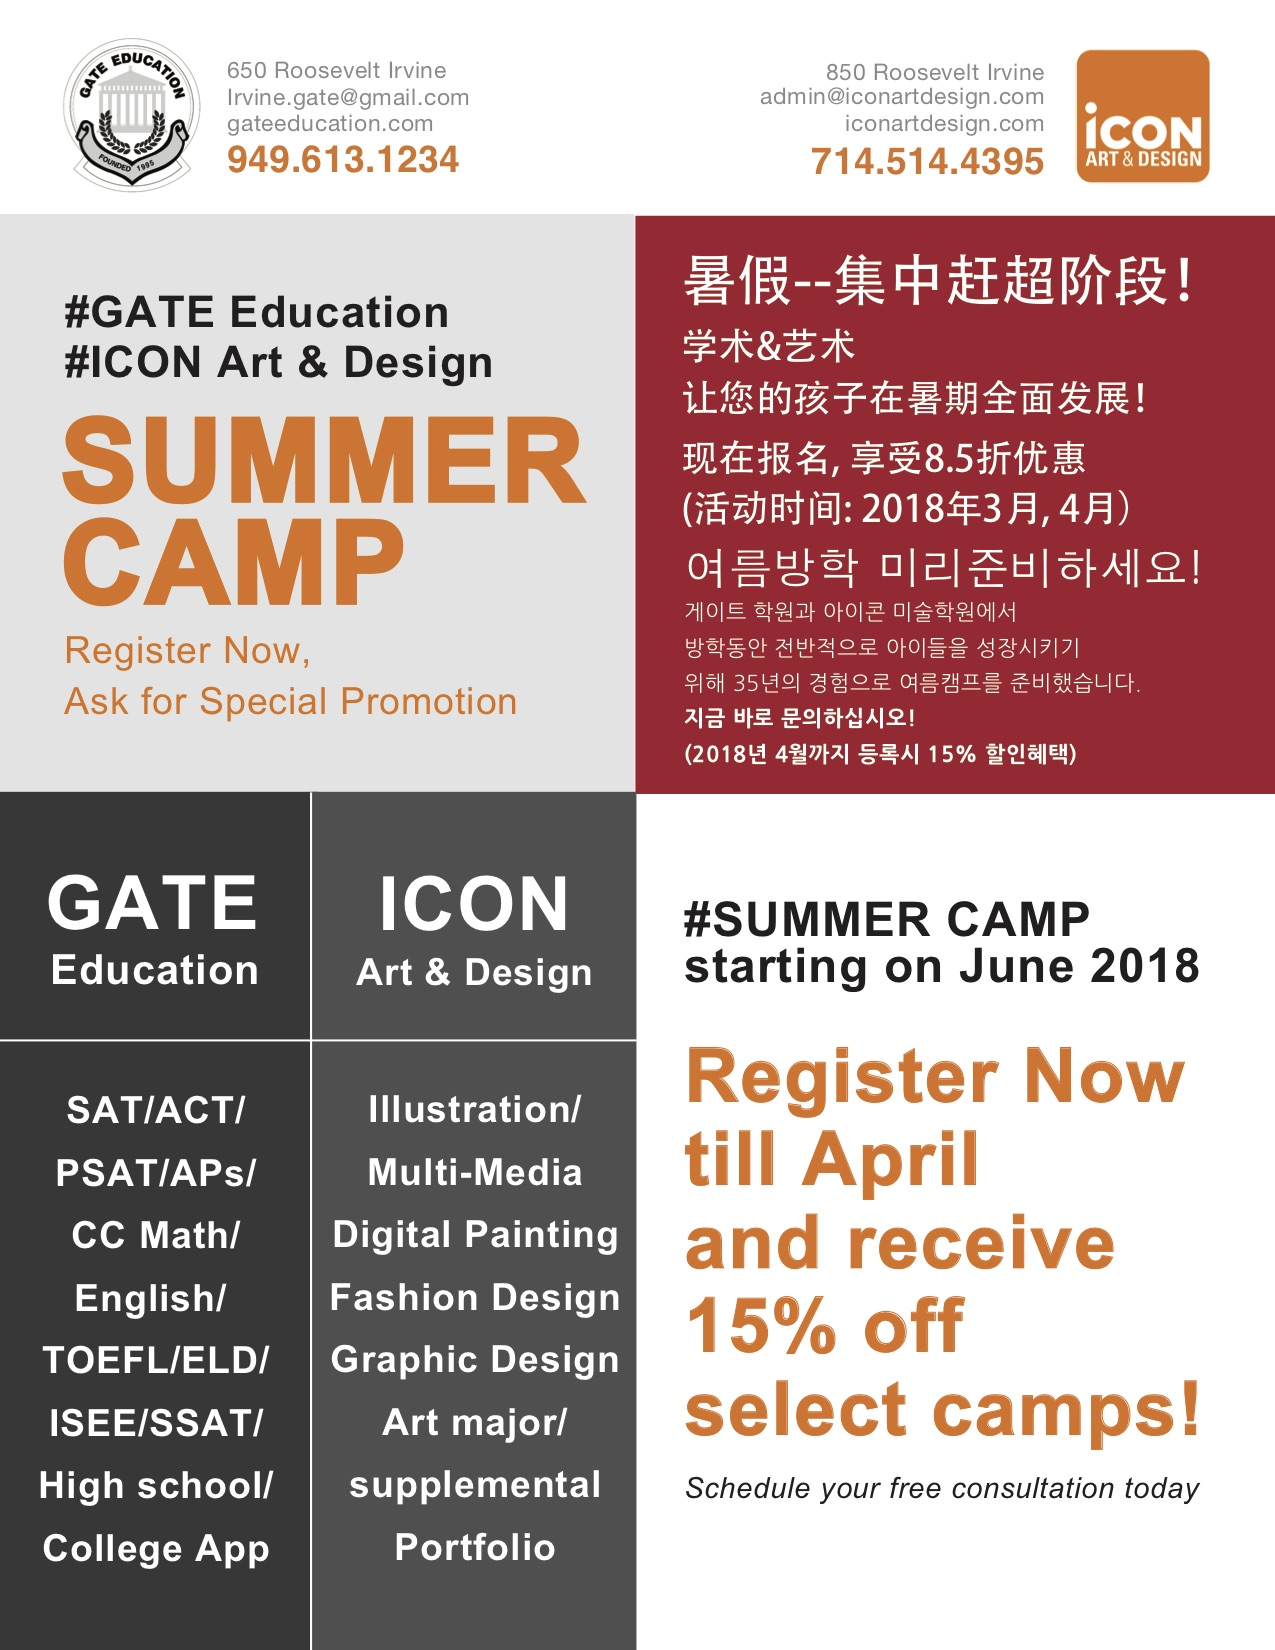 summercamp_gate_icon.jpg